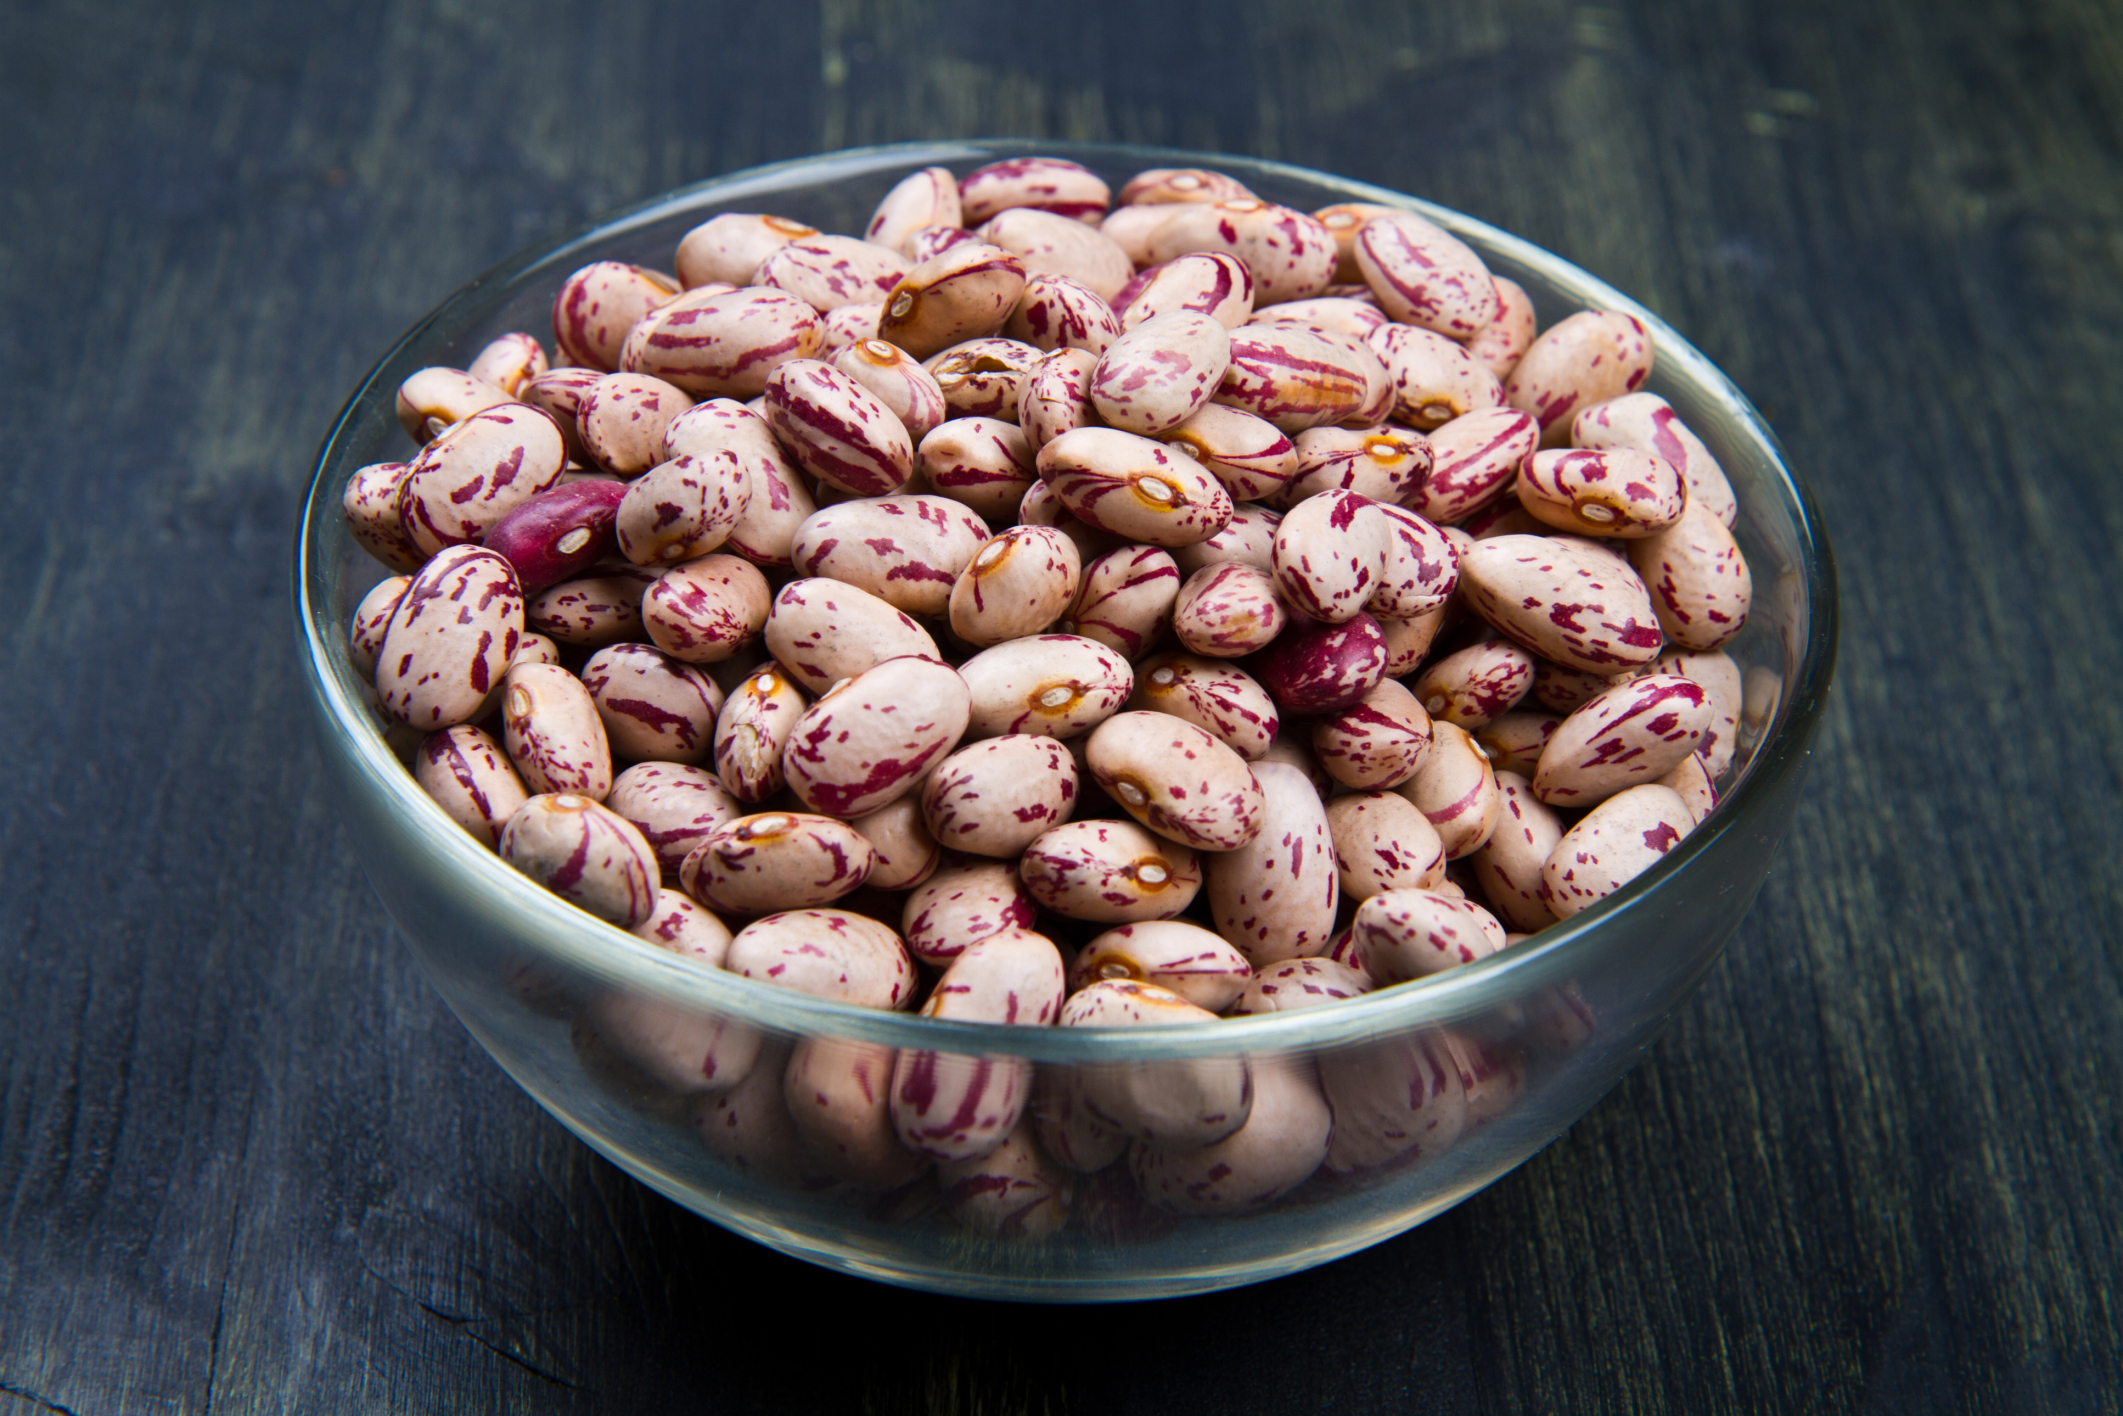 Green coffee bean extract and pure garcinia cambogia